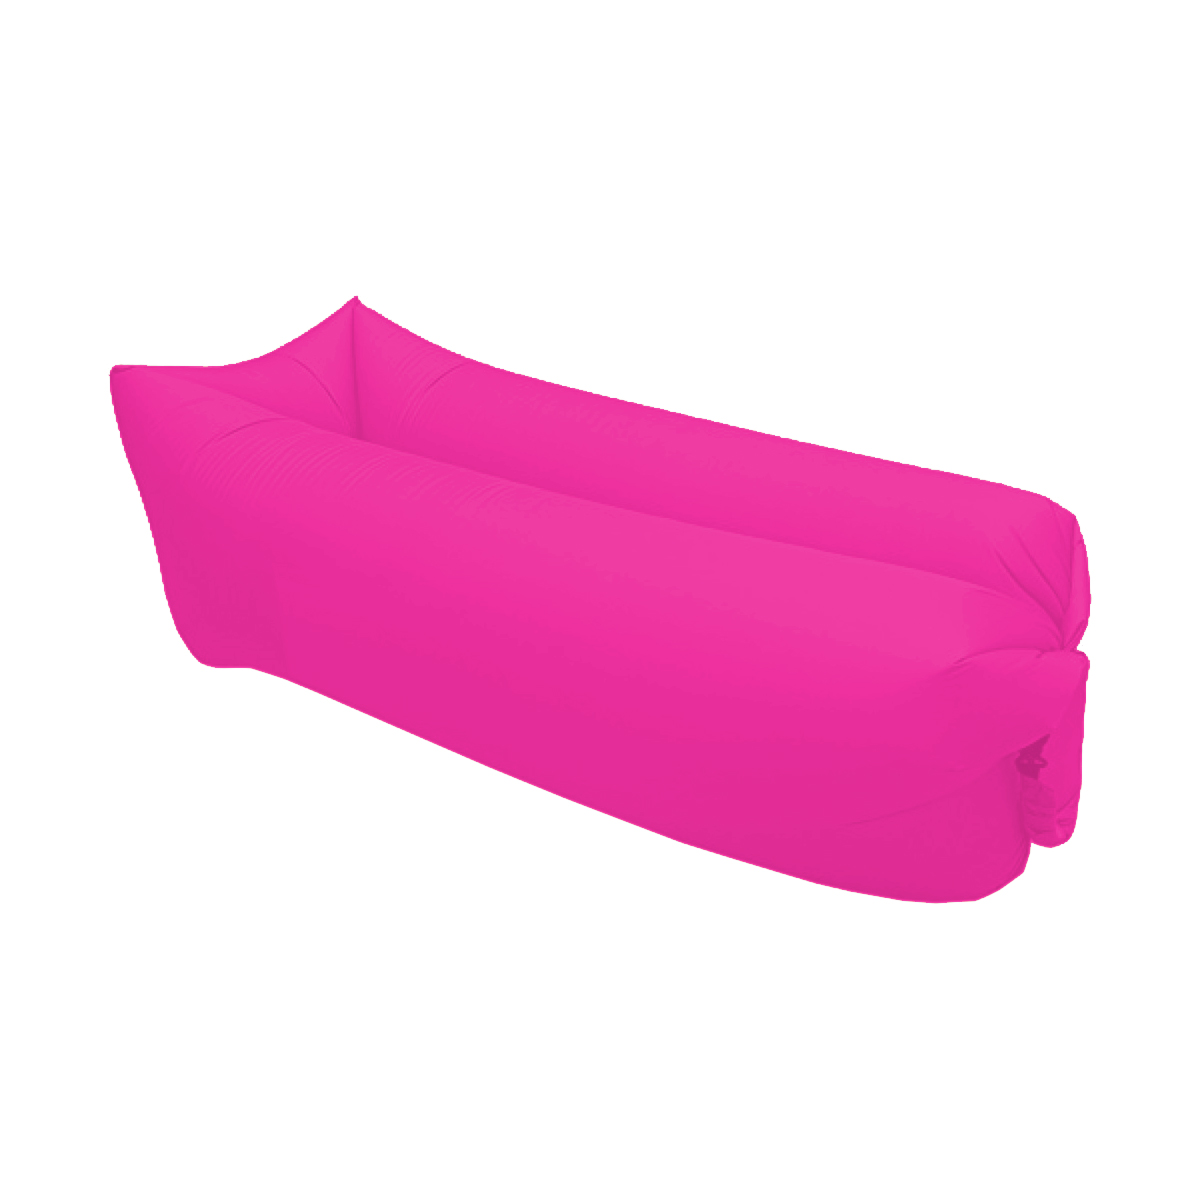 Colchon-colchoneta-cama-hinchable-sofa-lazy-bags-sillon-inflado-manual-rapido